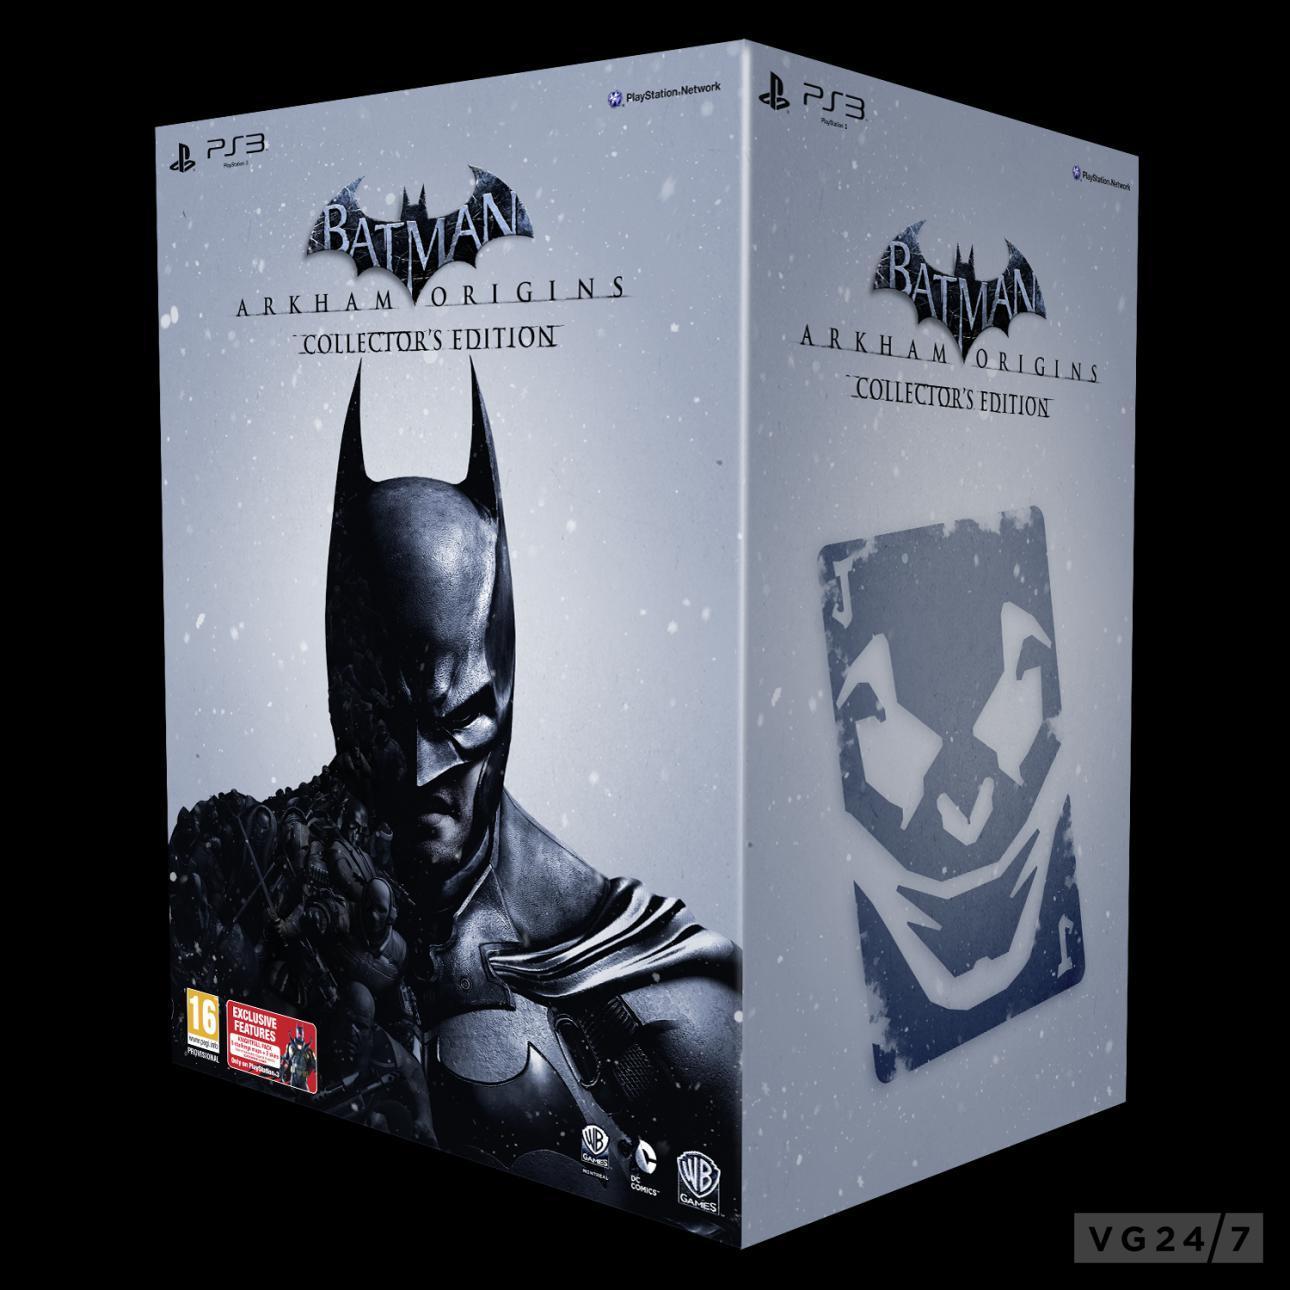 Batman deathstroke arkham origins